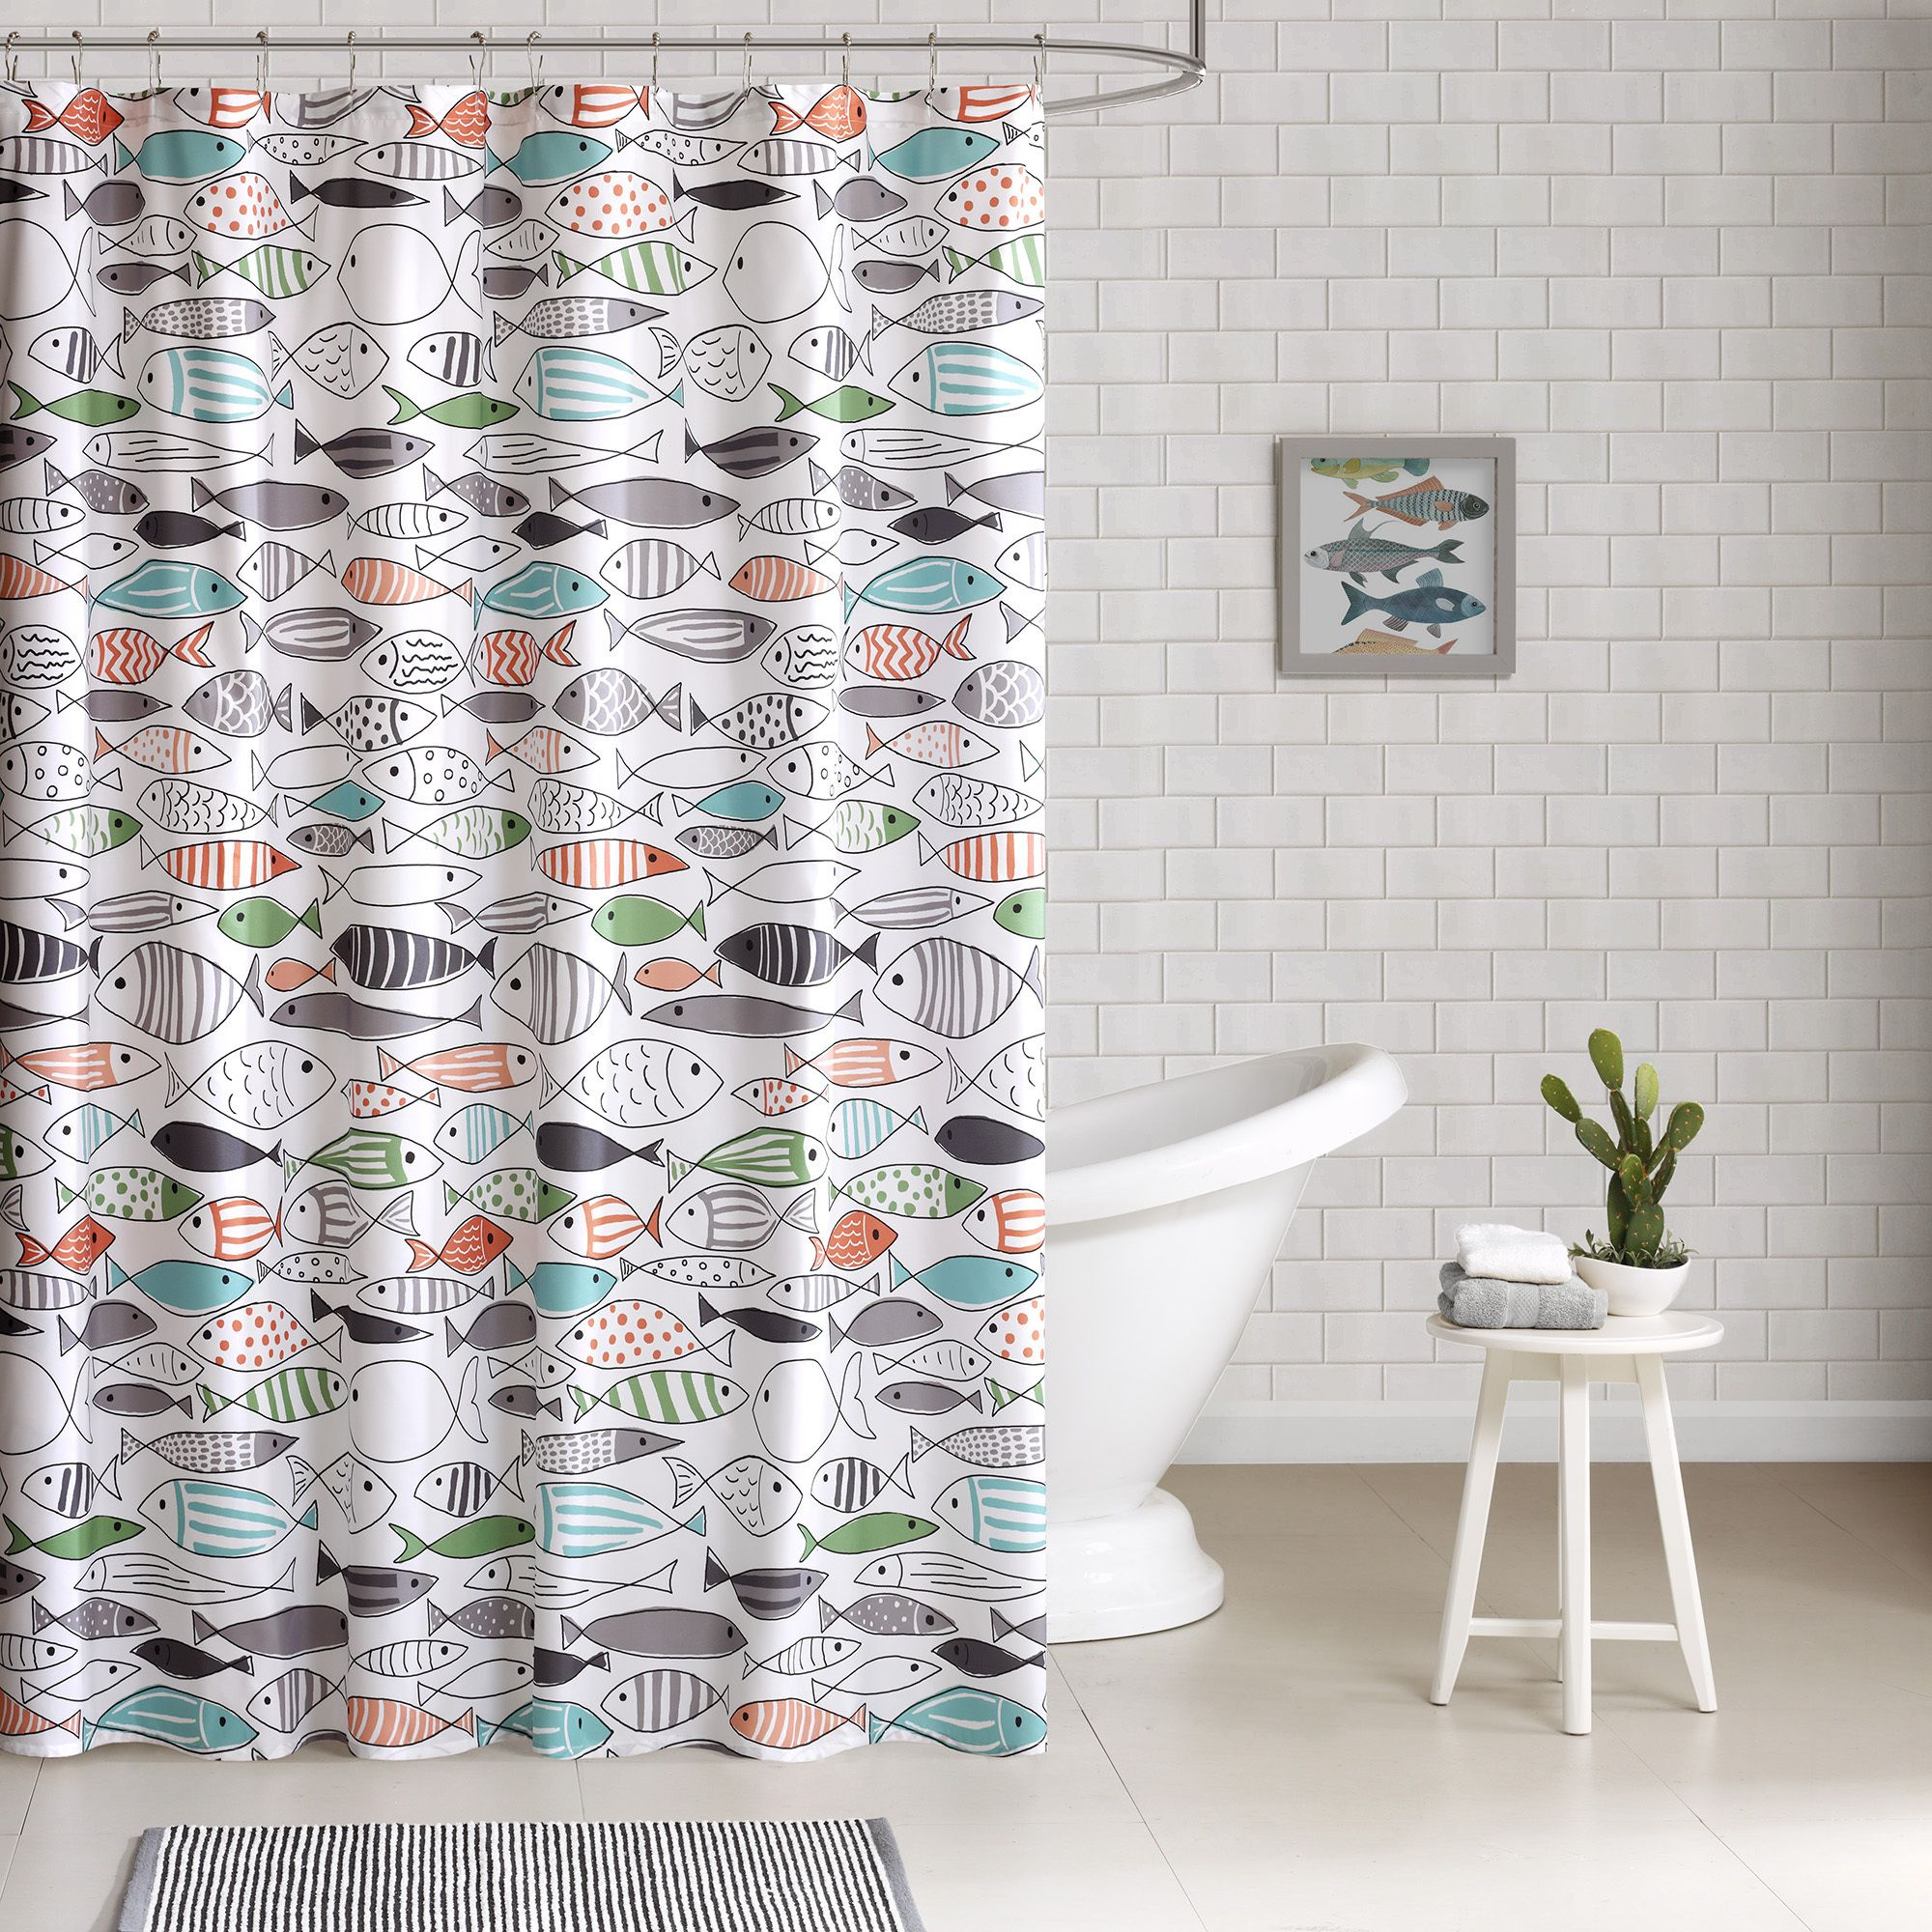 Pics photos children bathroom themes shower curtains fish animals - Hipstyle Madfish Cotton Printed Shower Curtain By Hipstyle Fish Swimming Bathroom Stuffbathroom Ideasbathroom